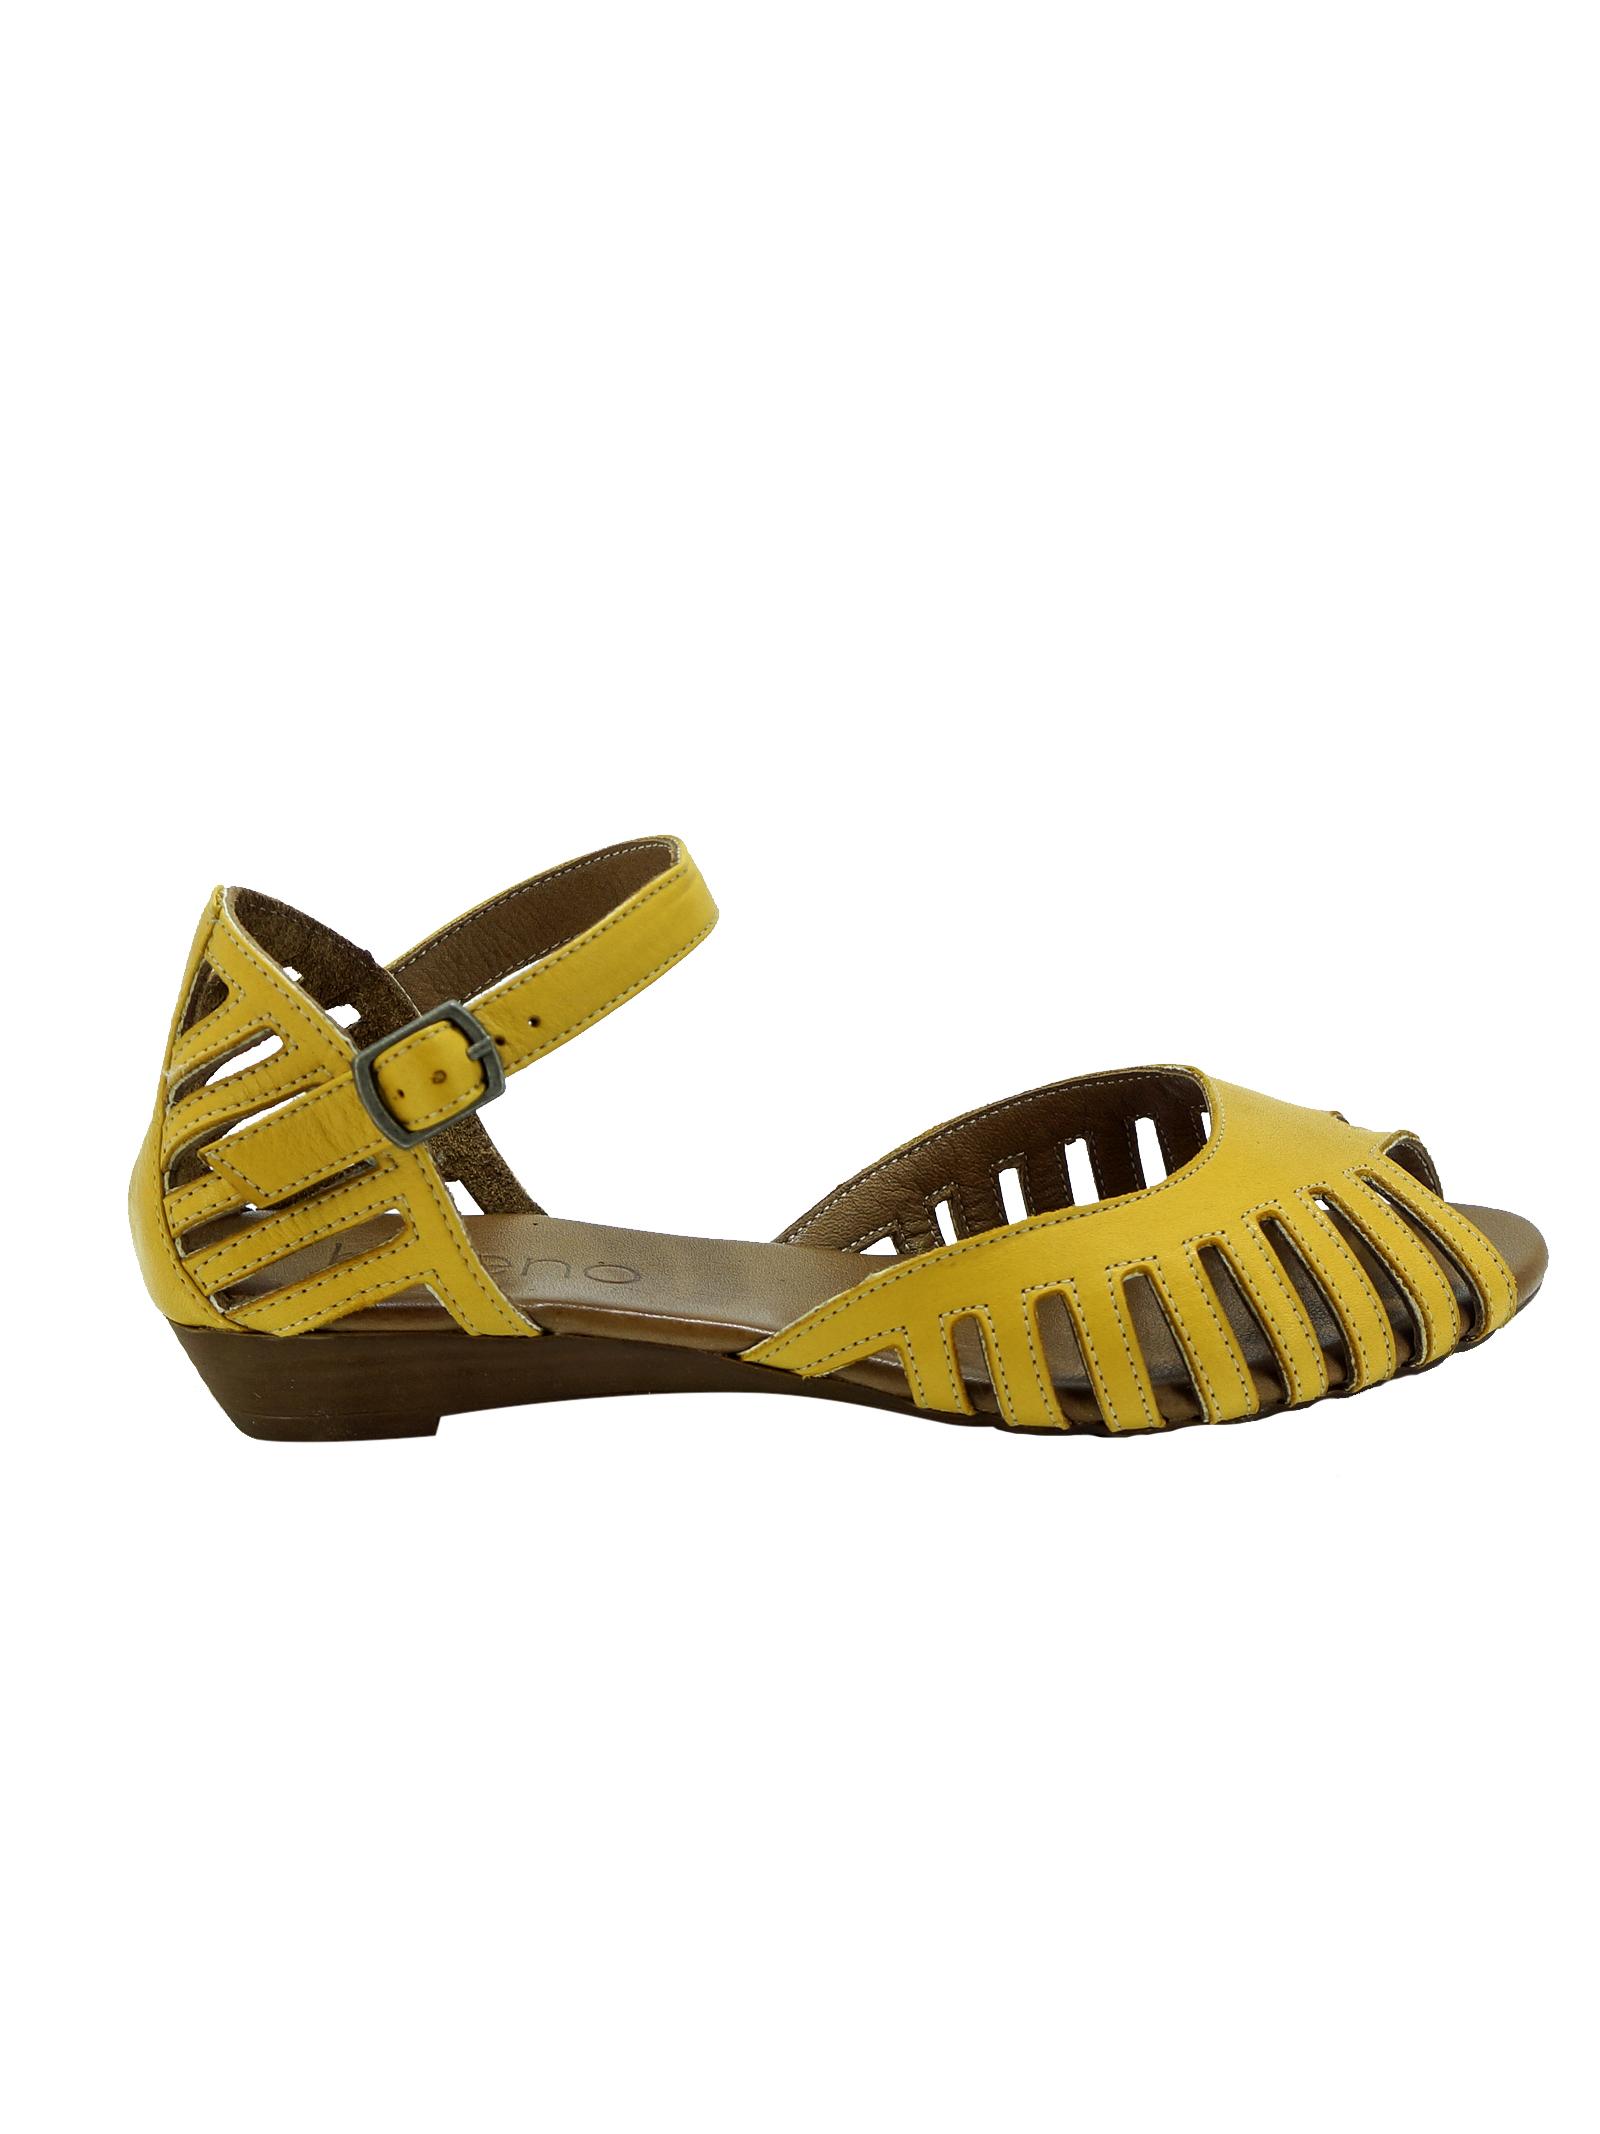 Sandali Donna Mary Jane in Pelle Bueno Bueno   Sandali   N3800YELLOW